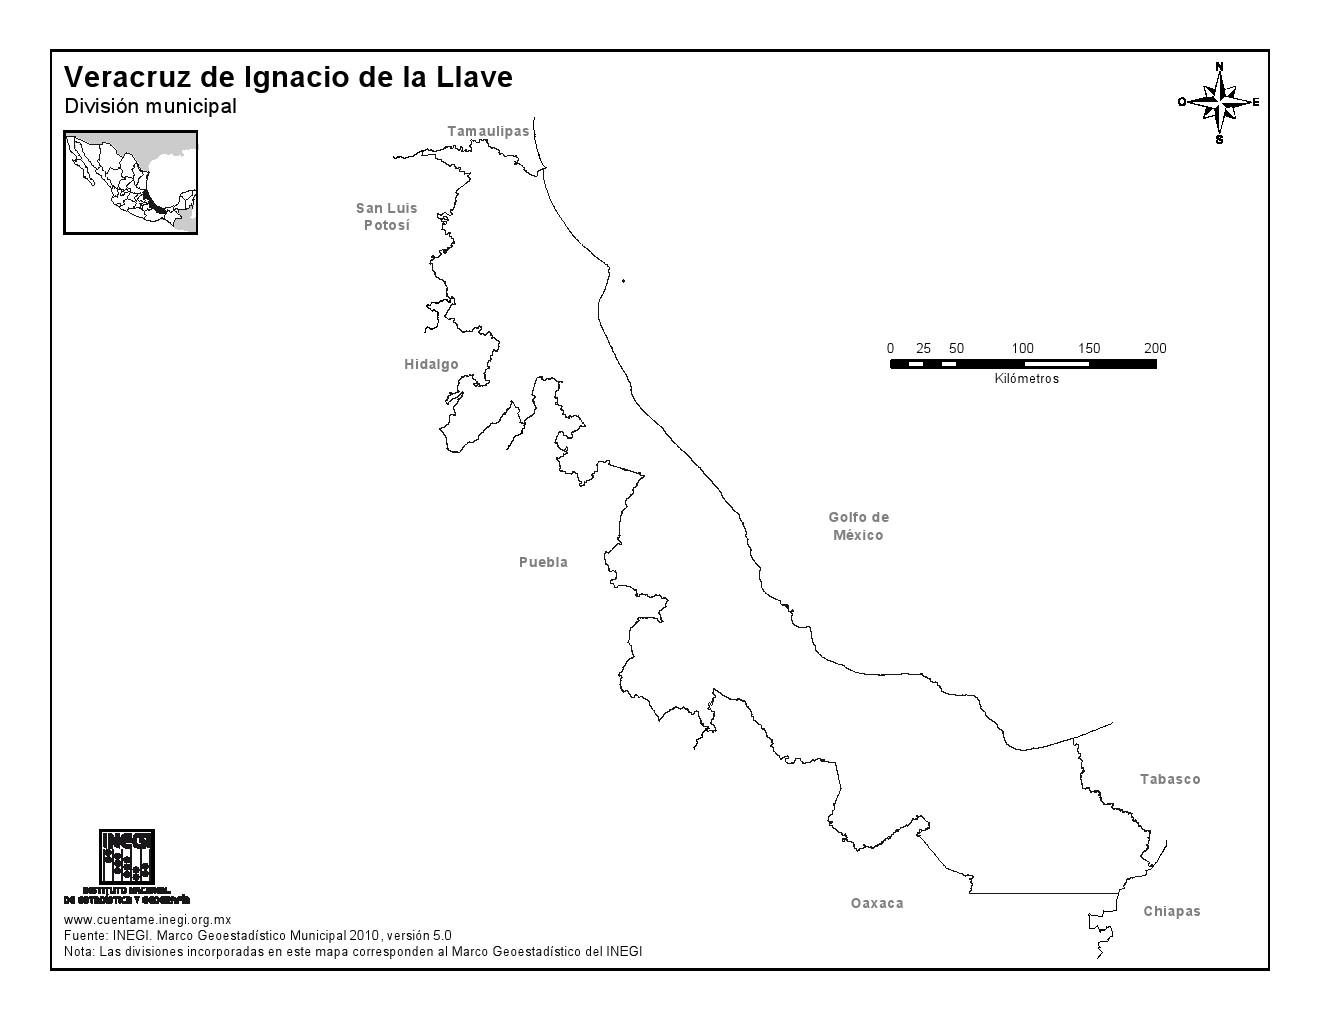 Mapa mudo de Veracruz. INEGI de México